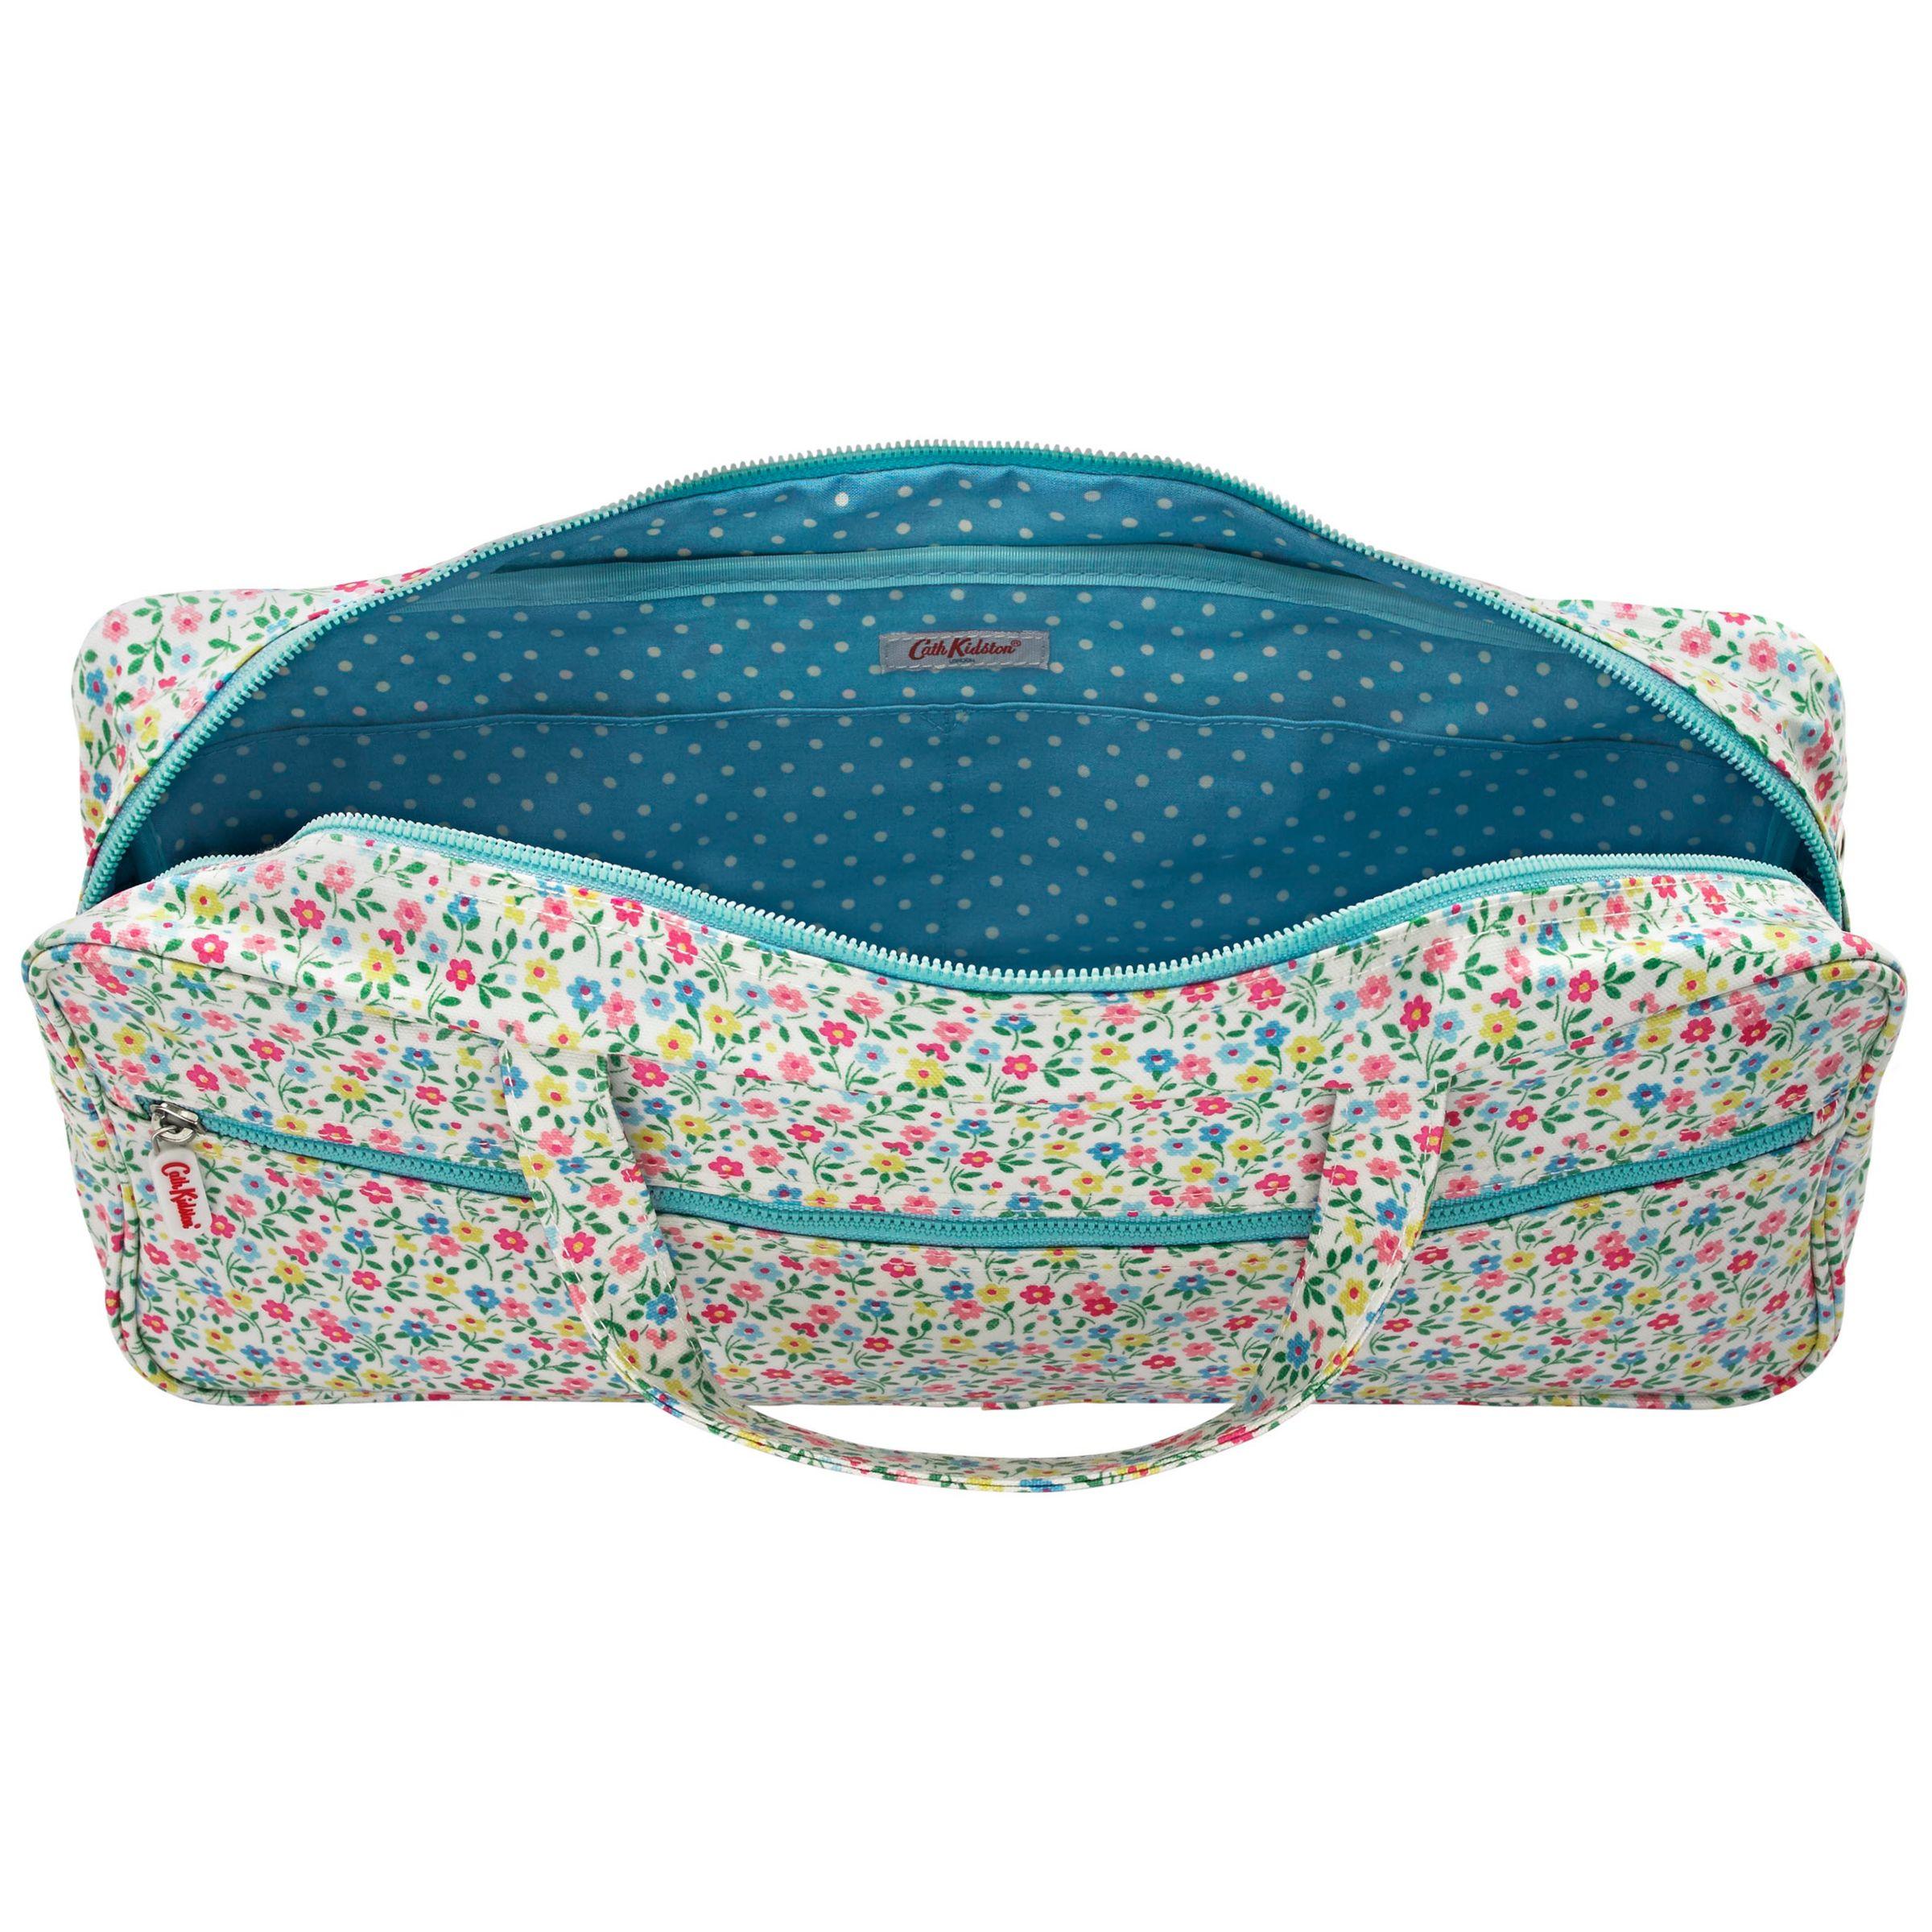 Buy Cath Kidston Trailing Daisy Floral Knitting Bag John Lewis